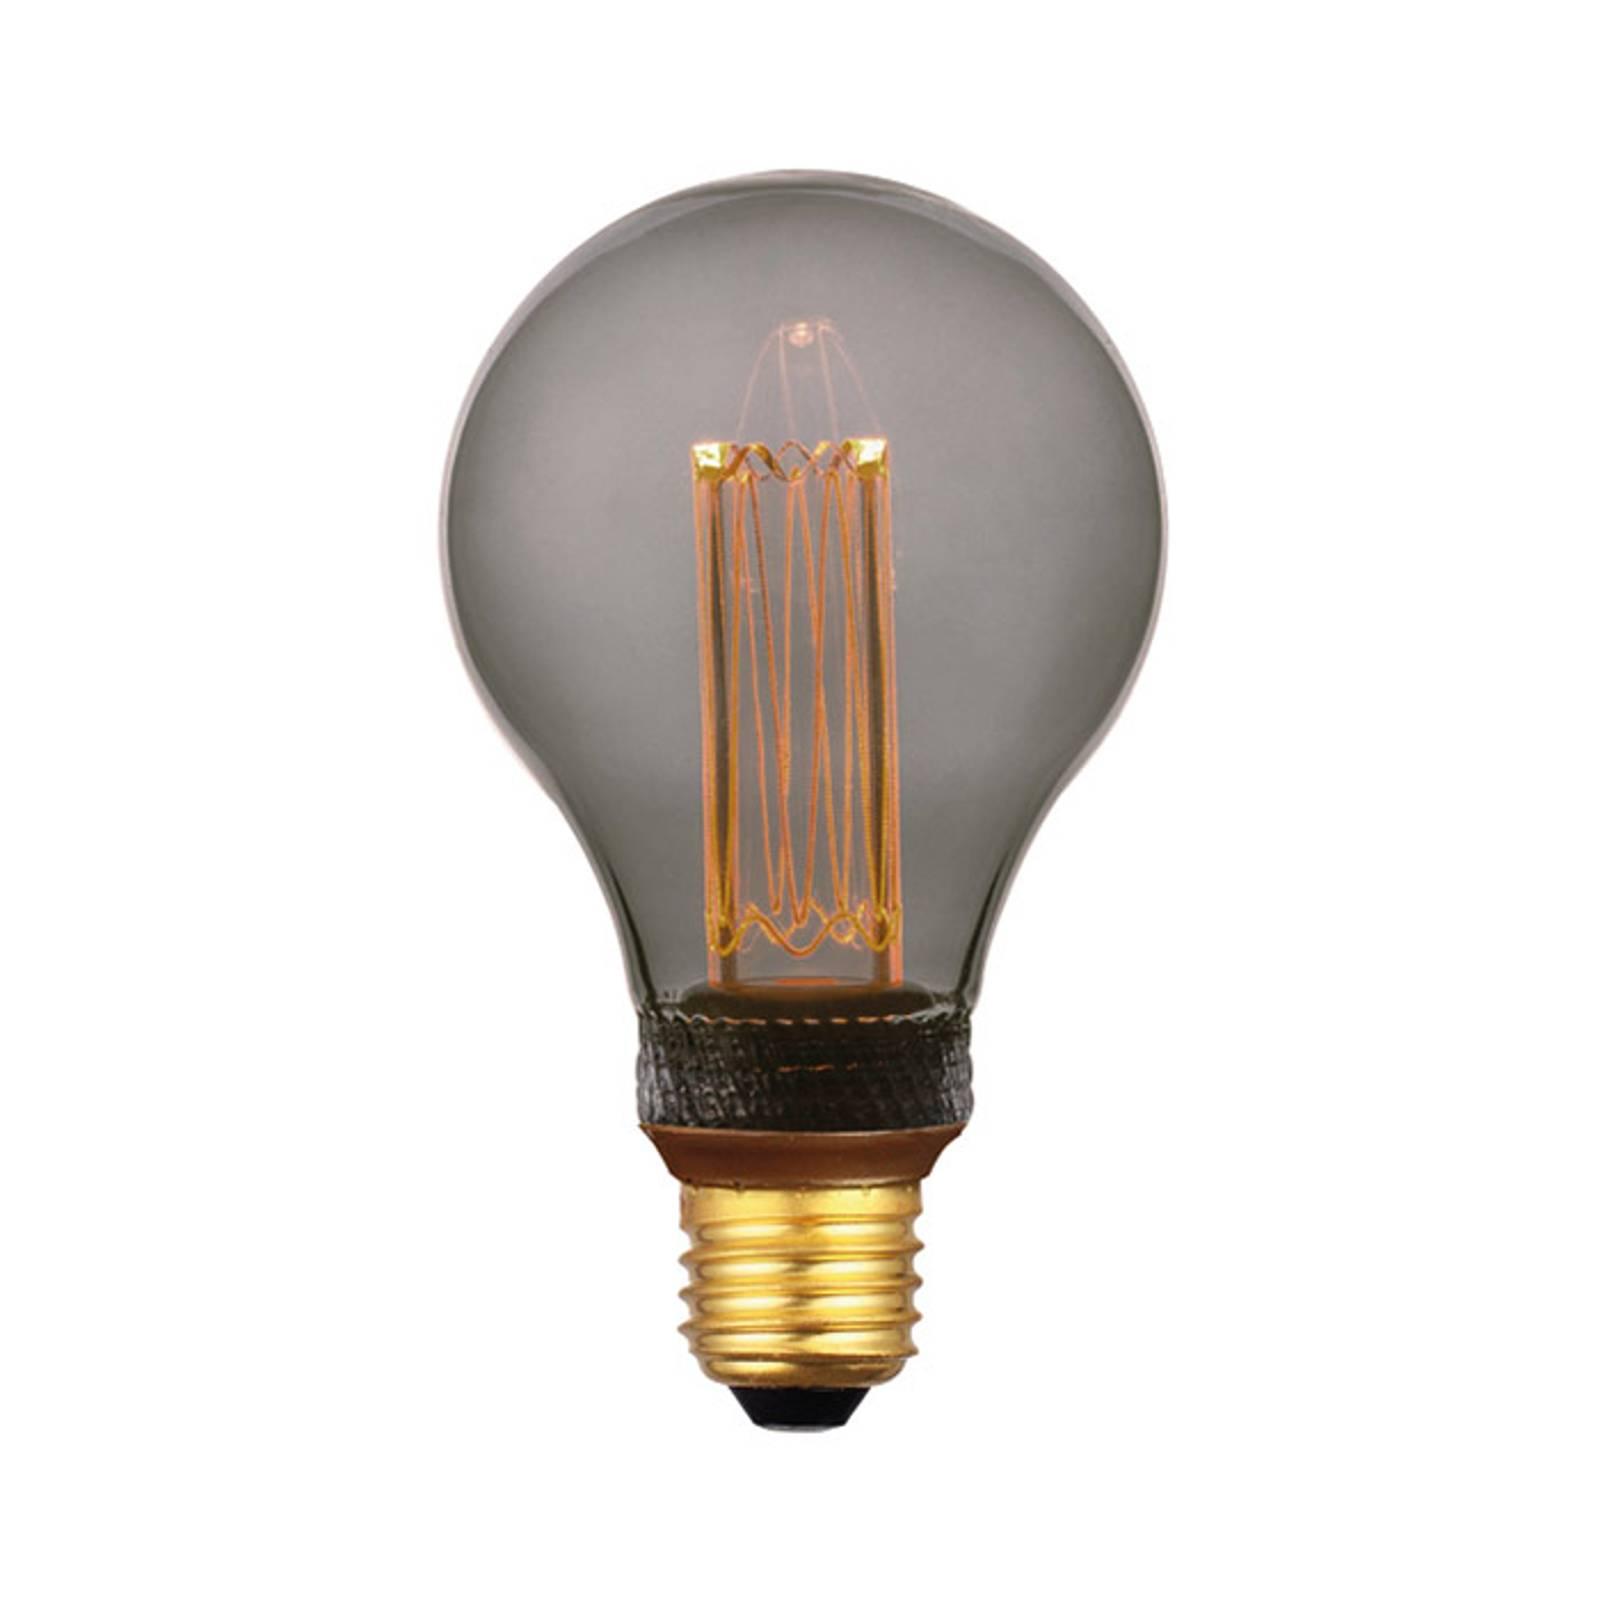 Freelight LED-lampa E27 5W, varmvit, 3-step-dim, smoke 14 cm